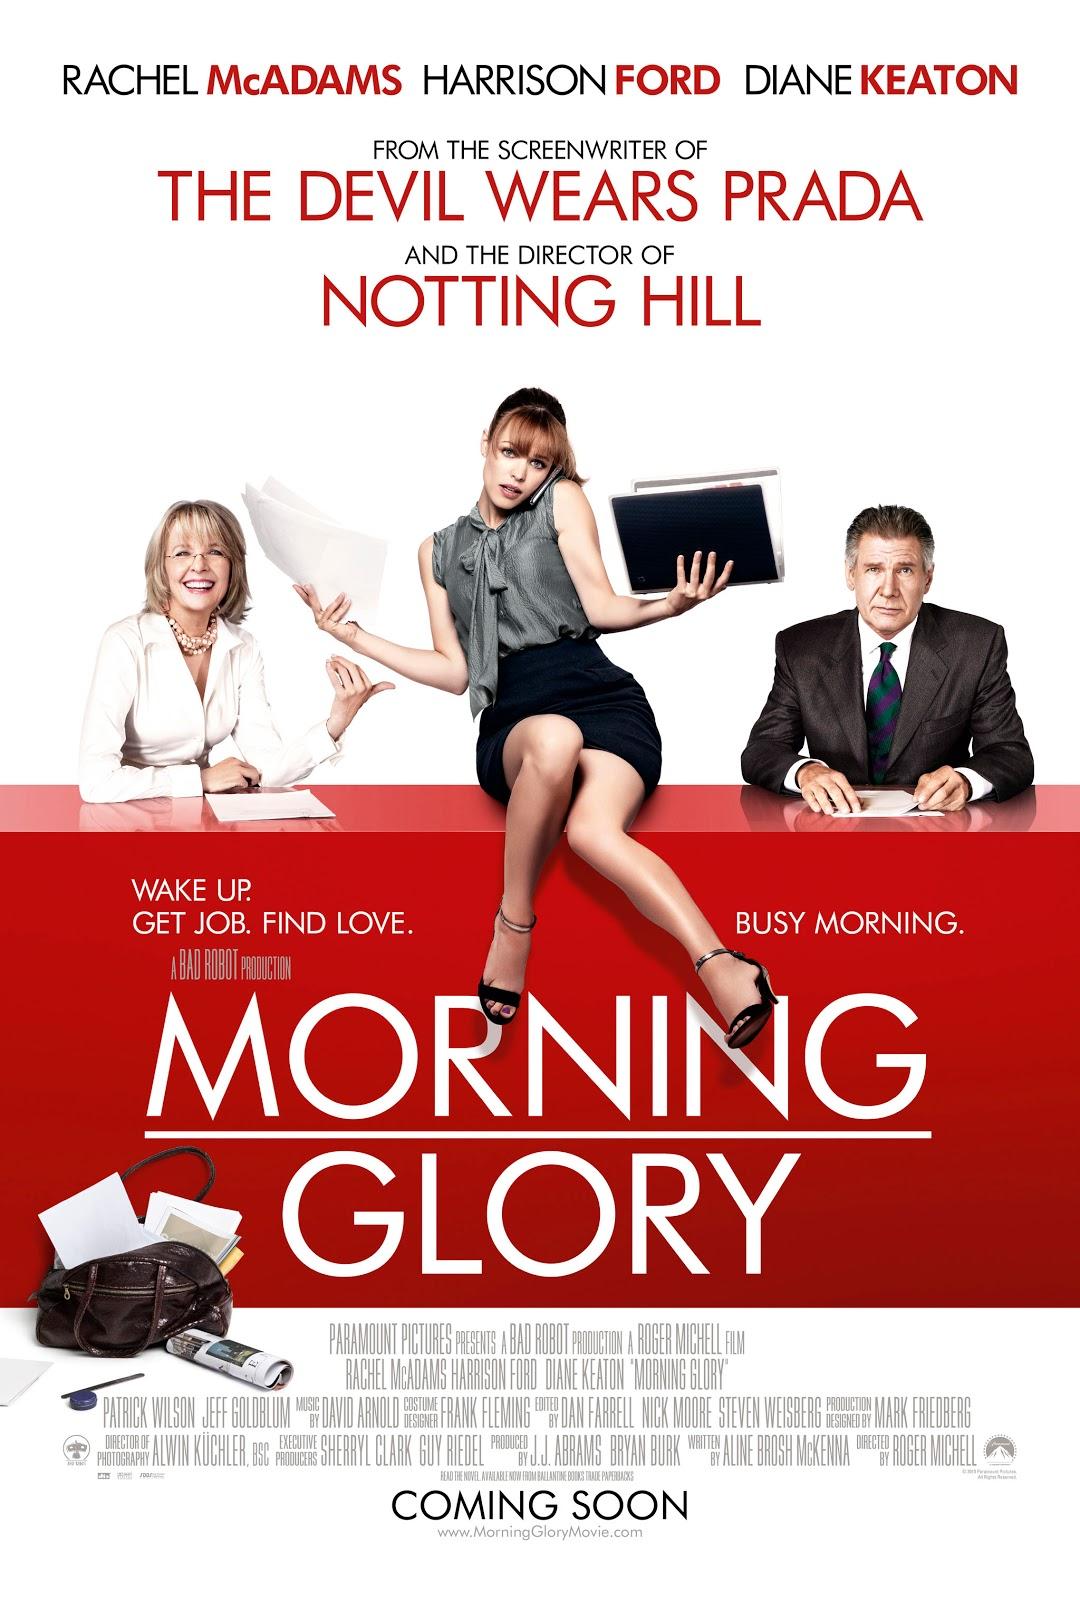 http://2.bp.blogspot.com/-iBSzzo6UEq8/TZ50jRmgoMI/AAAAAAAADyE/4FJjYhgFi9o/s1600/Morning-Glory-UK-Poster.jpg